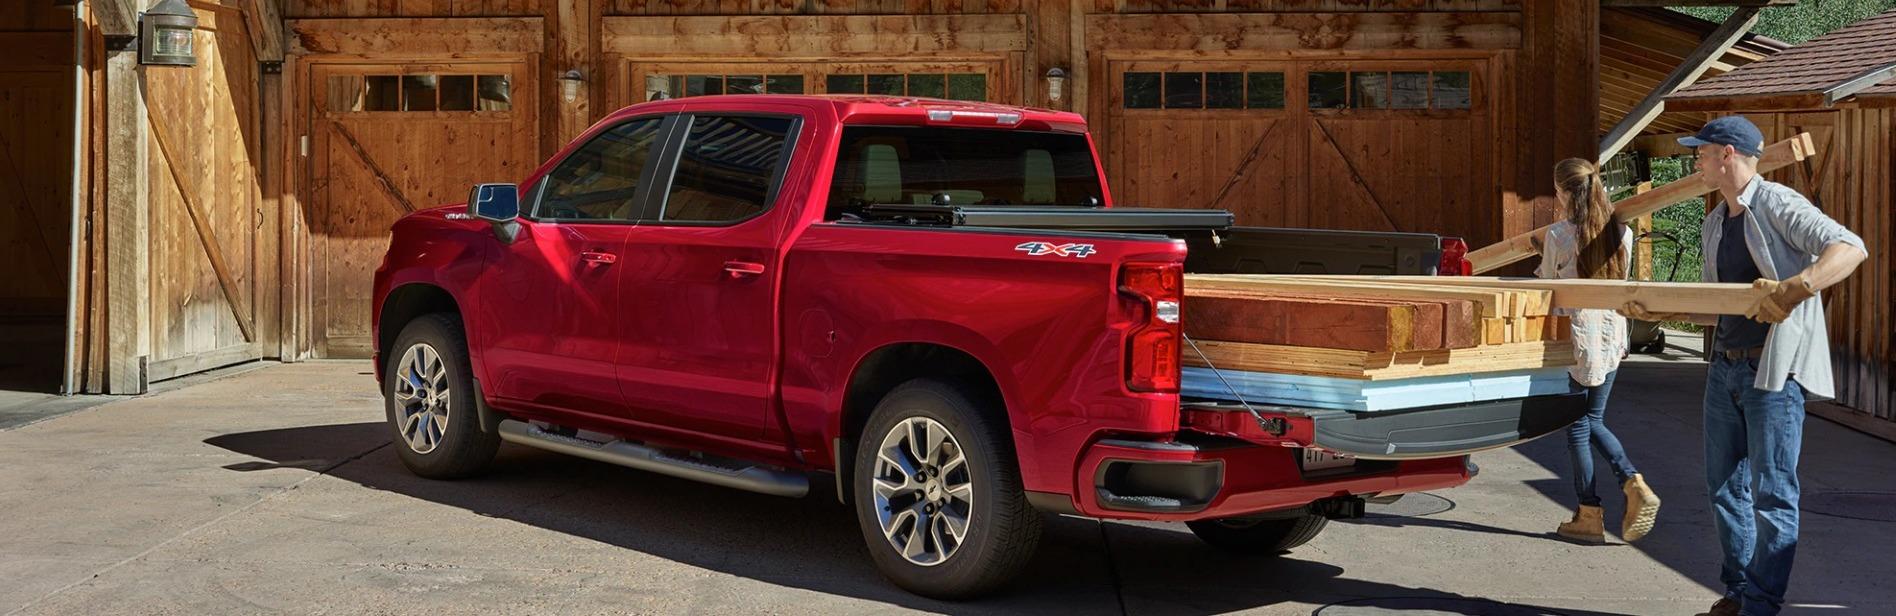 2020 Chevrolet Silverado 1500 Key Features near Pauls Valley, OK